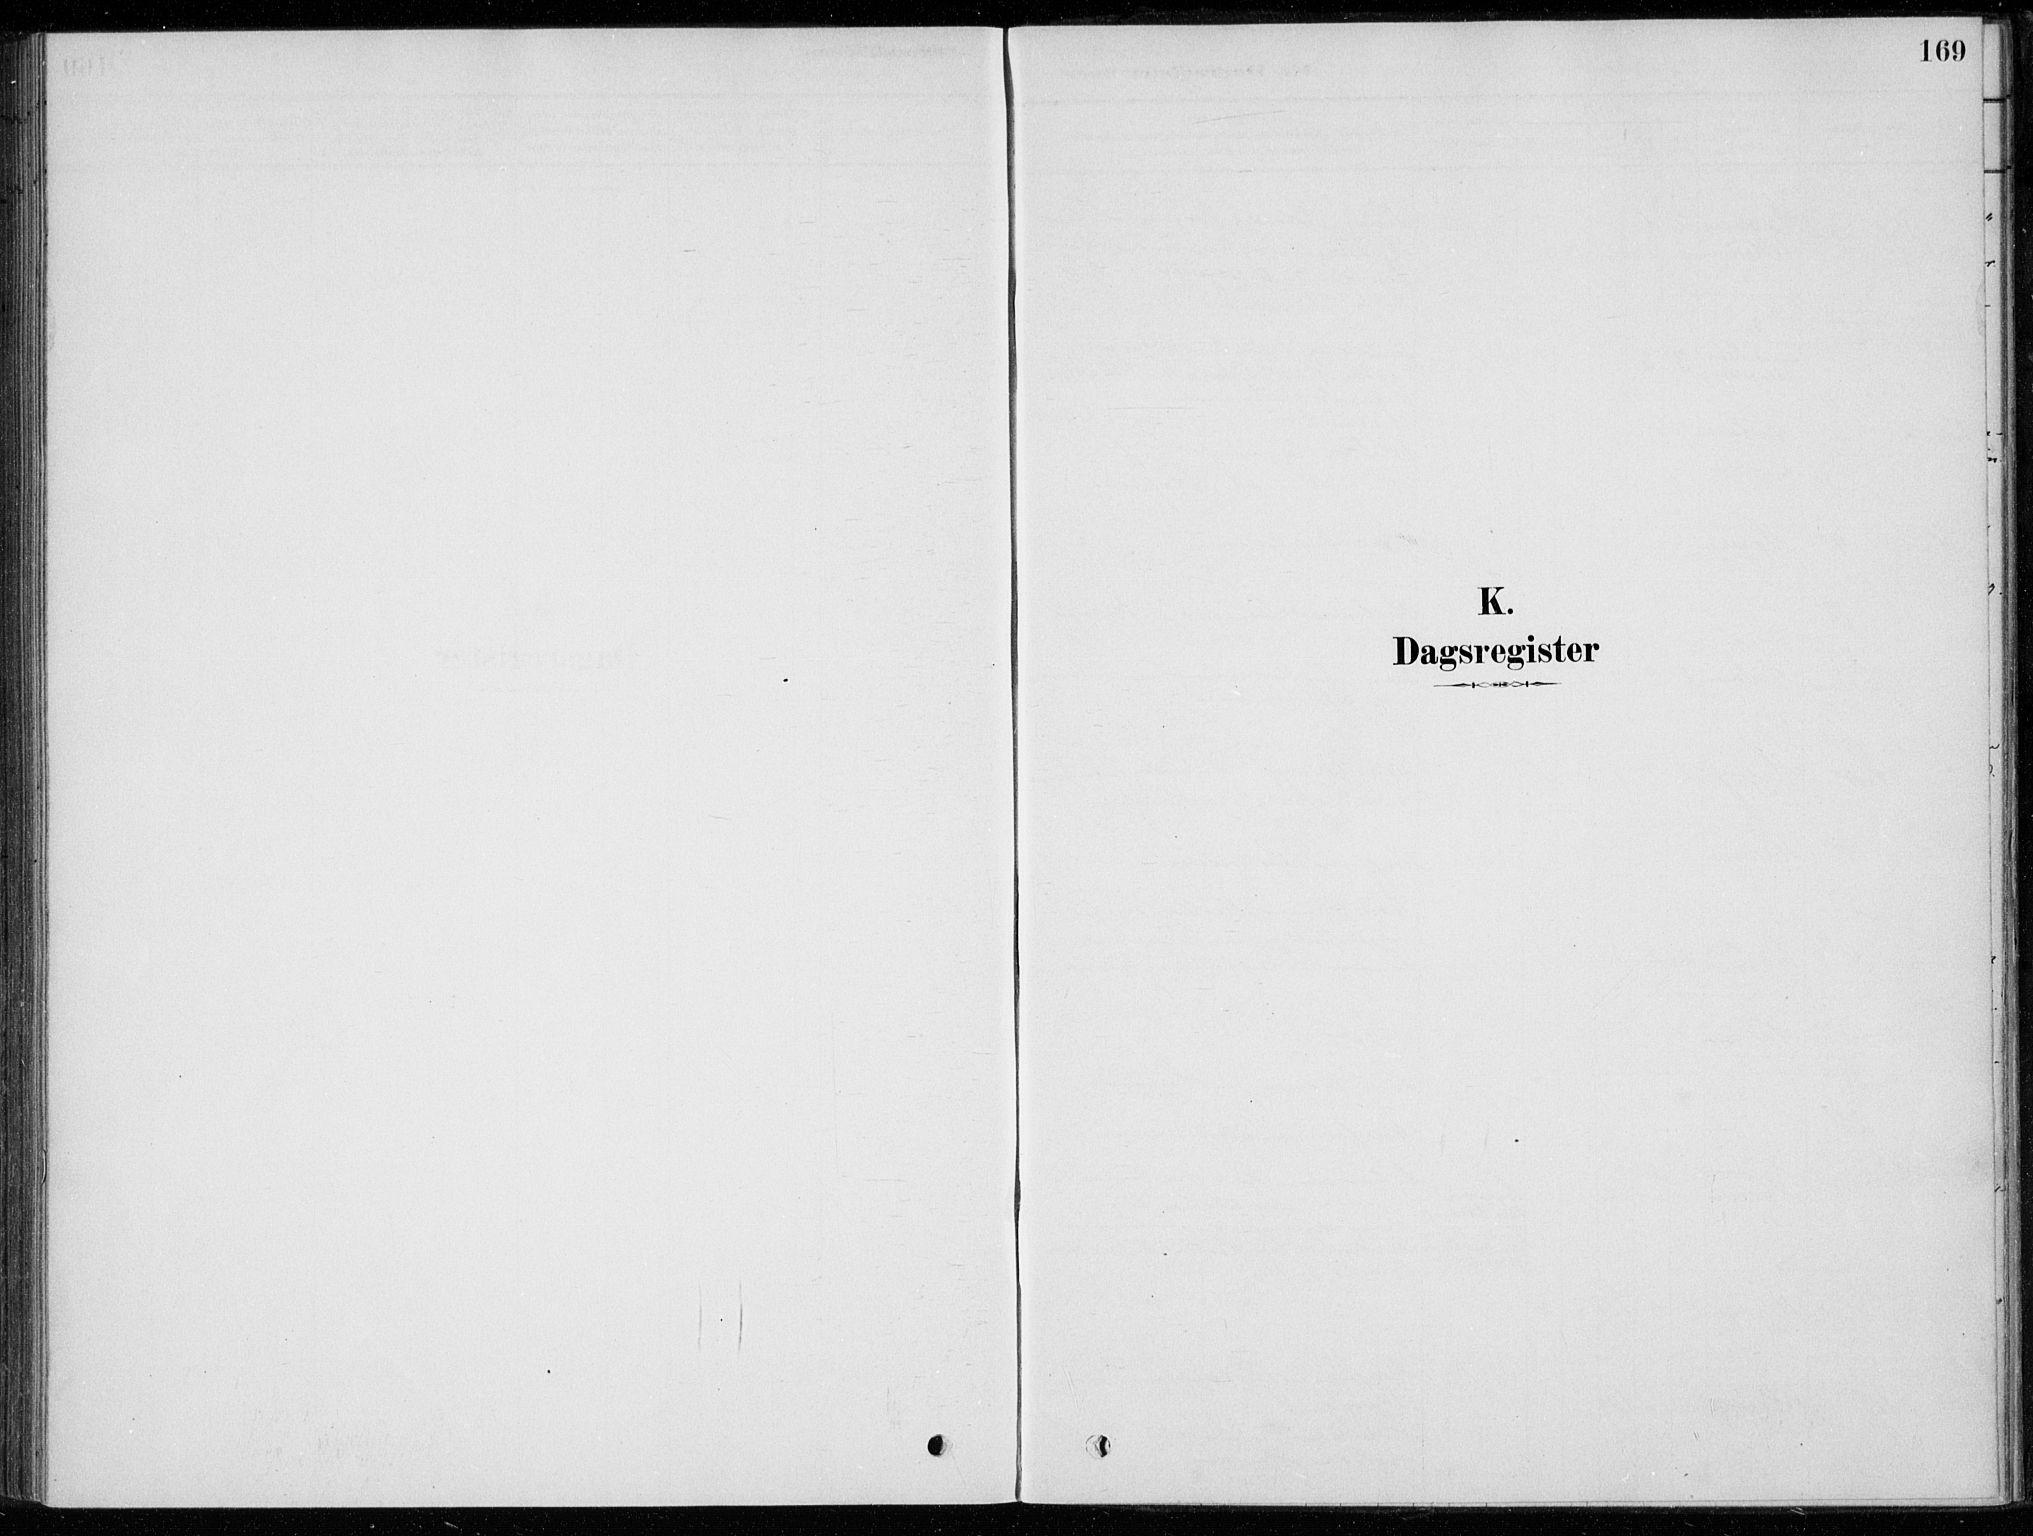 SAKO, Sigdal kirkebøker, F/Fc/L0001: Ministerialbok nr. III 1, 1879-1893, s. 169